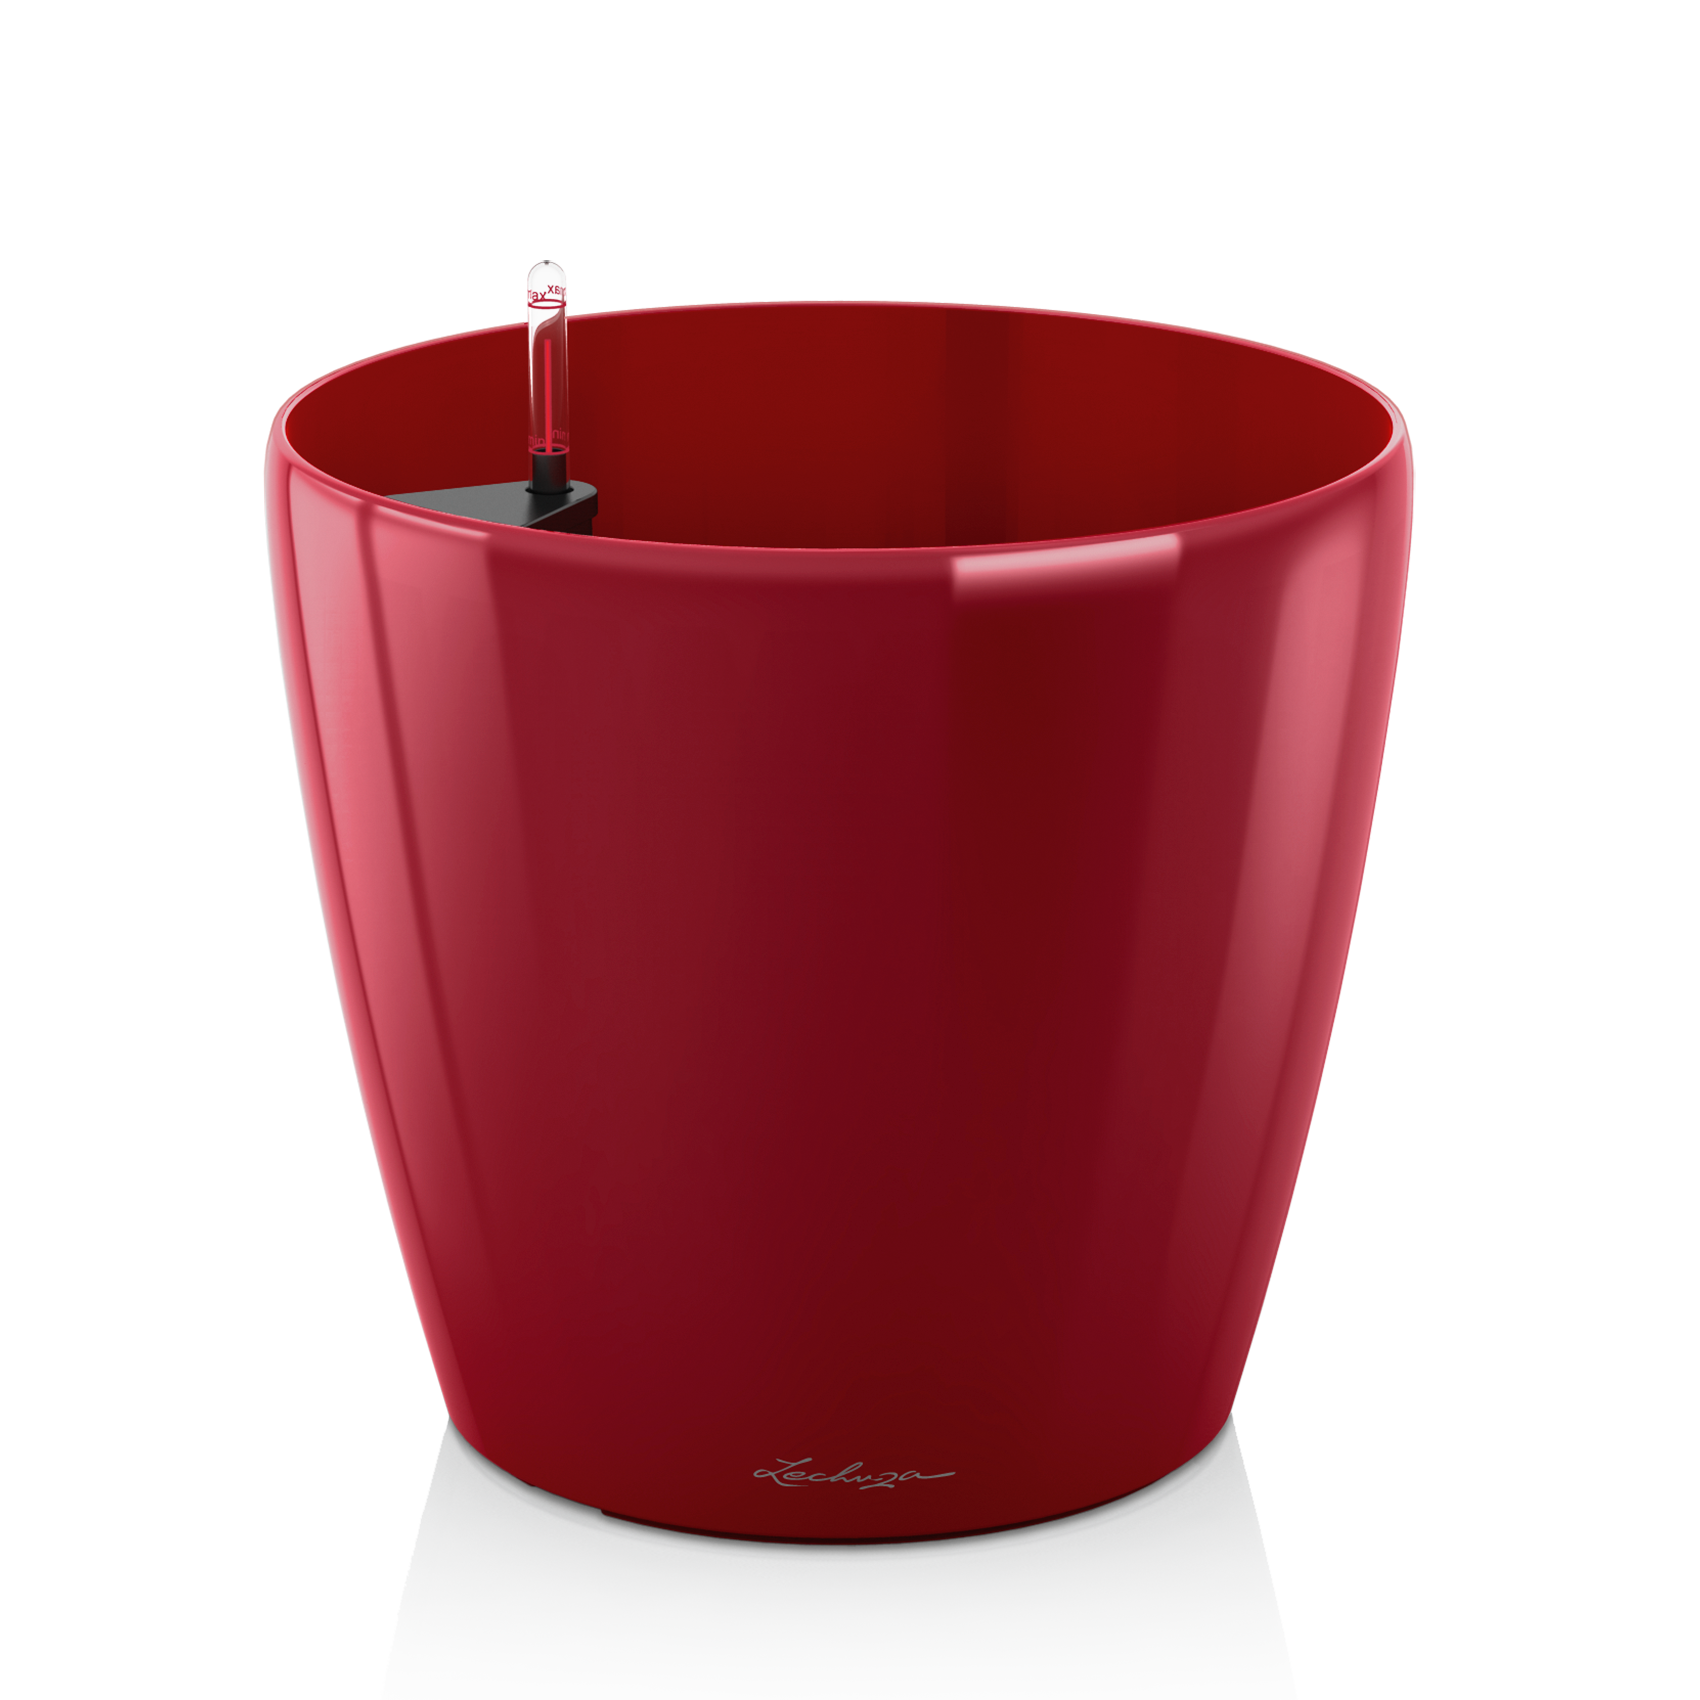 CLASSICO 70 scarlet rot hochglanz